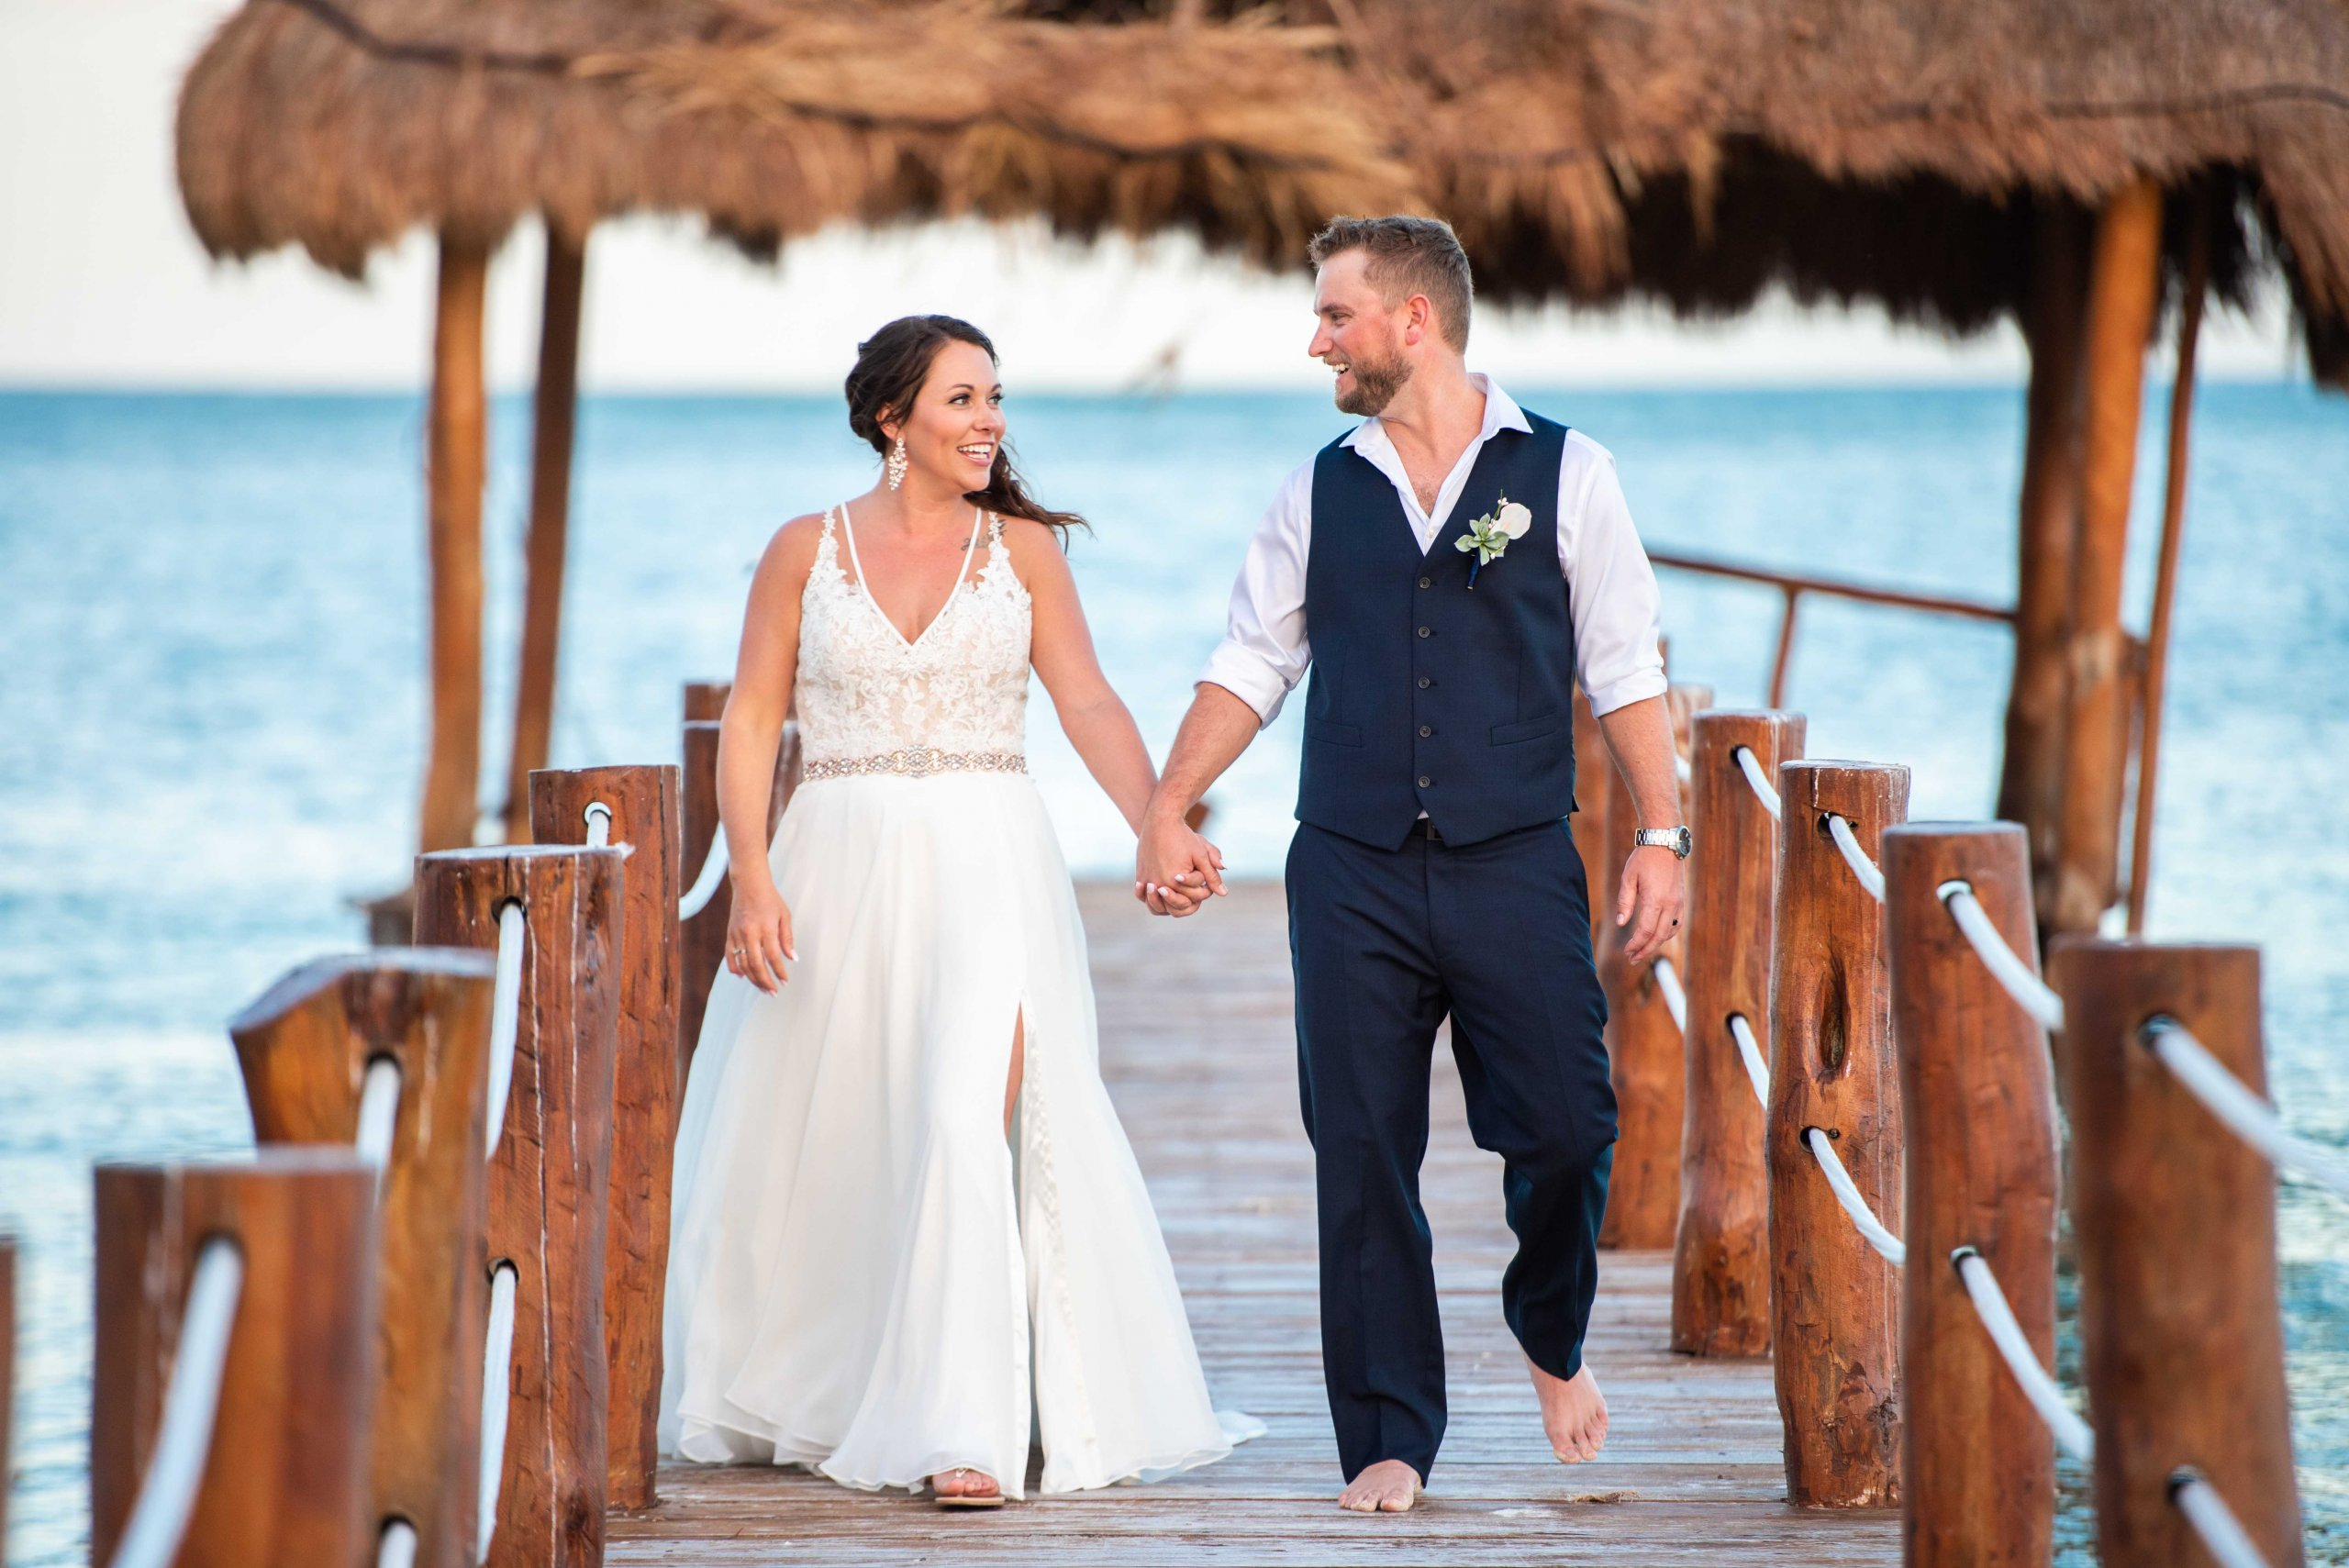 Beth Rob Margaritaville Island Reserve Riviera Cancun Wedding 37 scaled - Beth & Rob - Margaritaville Island Reserve